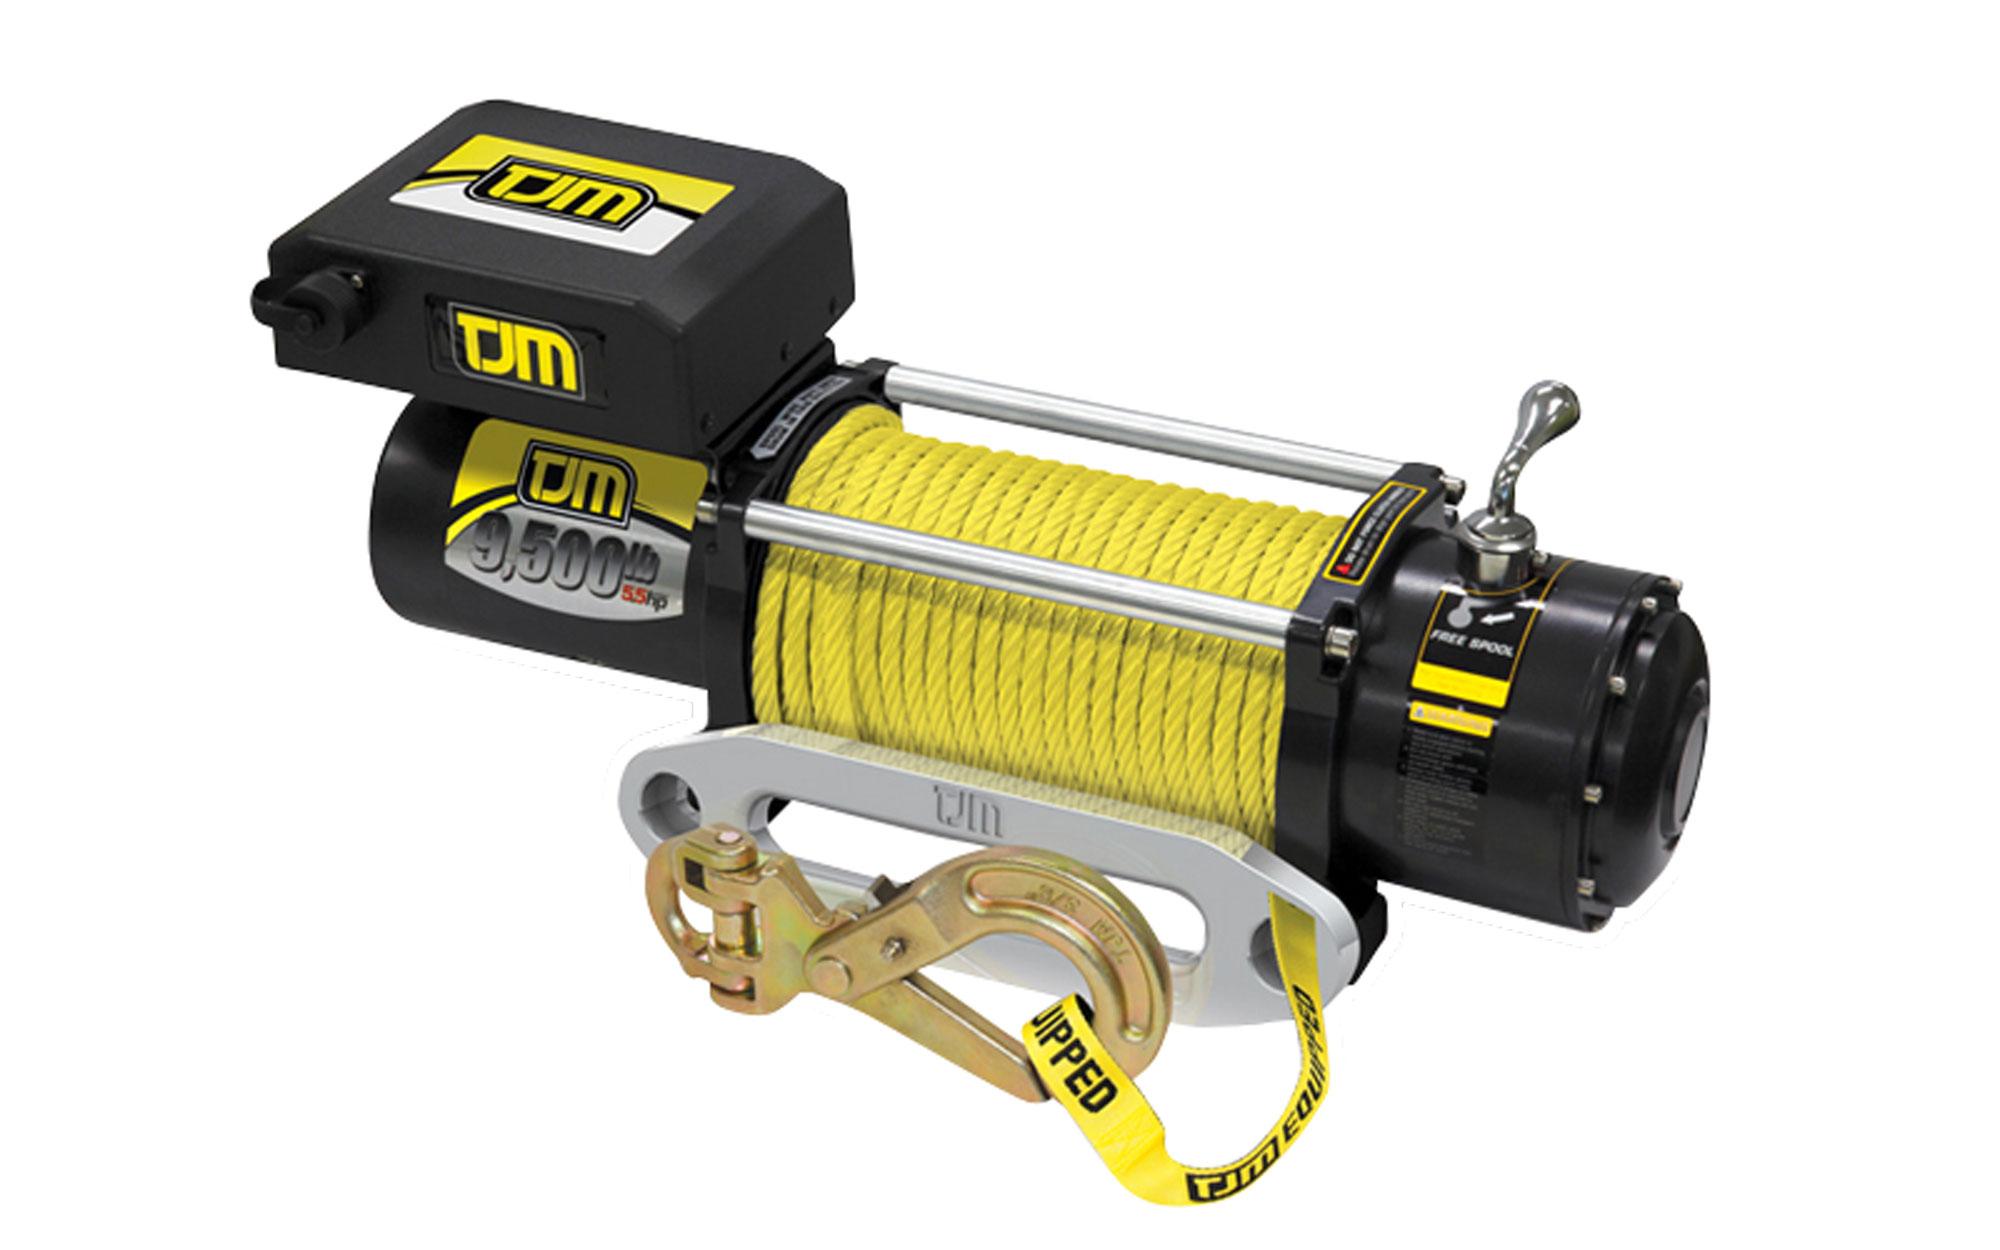 TJM 9500lb Synthetic Rope Torq Winch